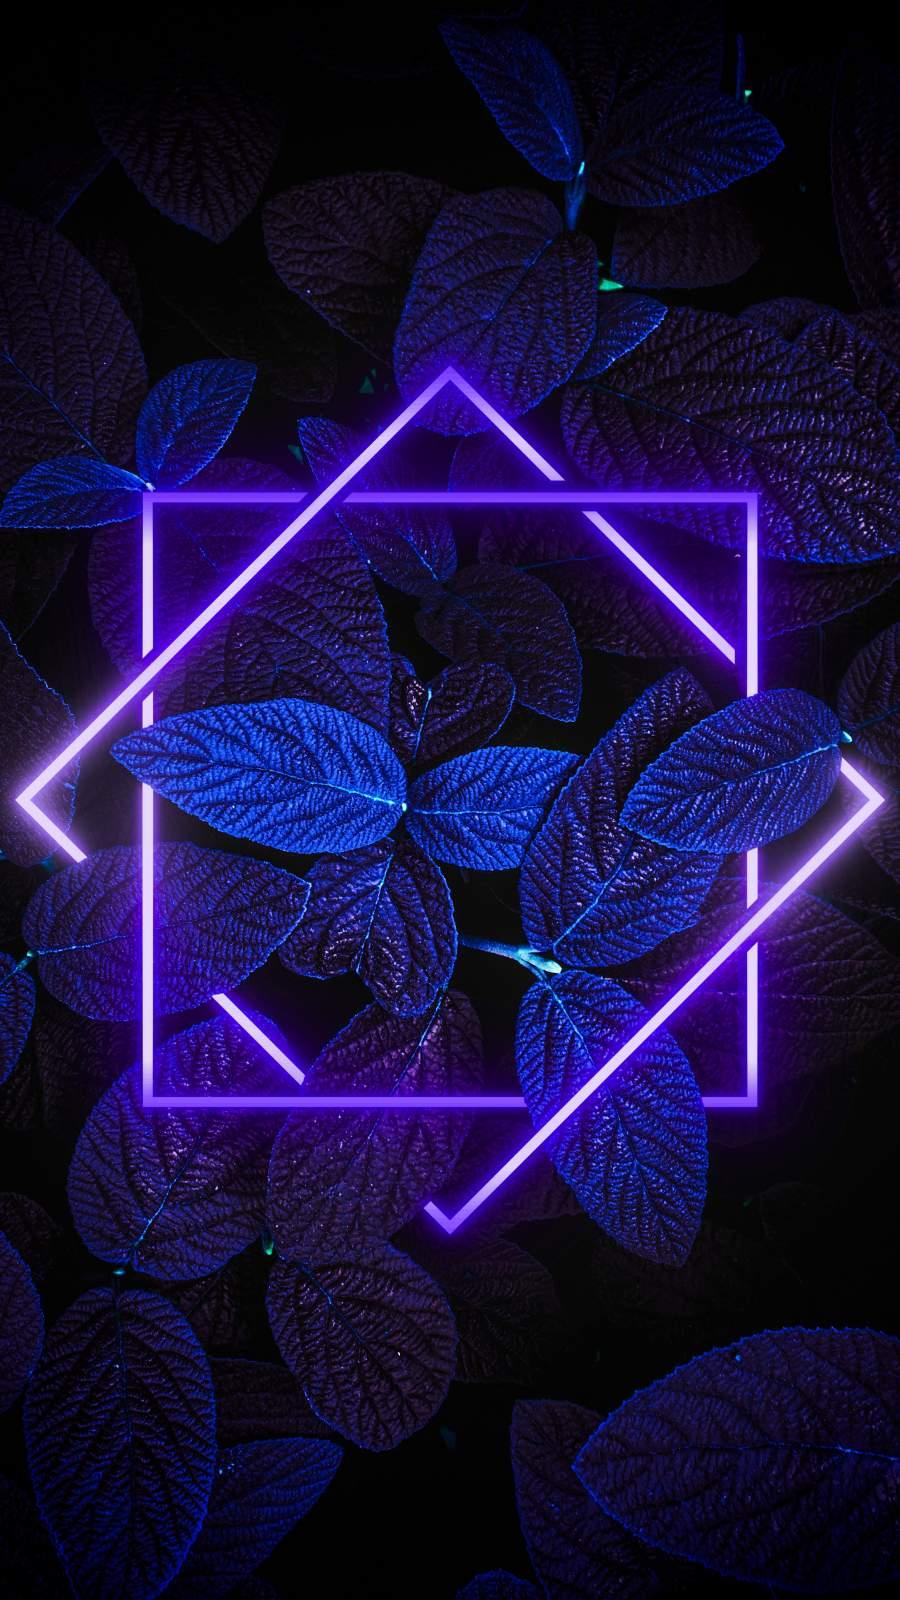 Dark Nature Neon Light iPhone Wallpaper